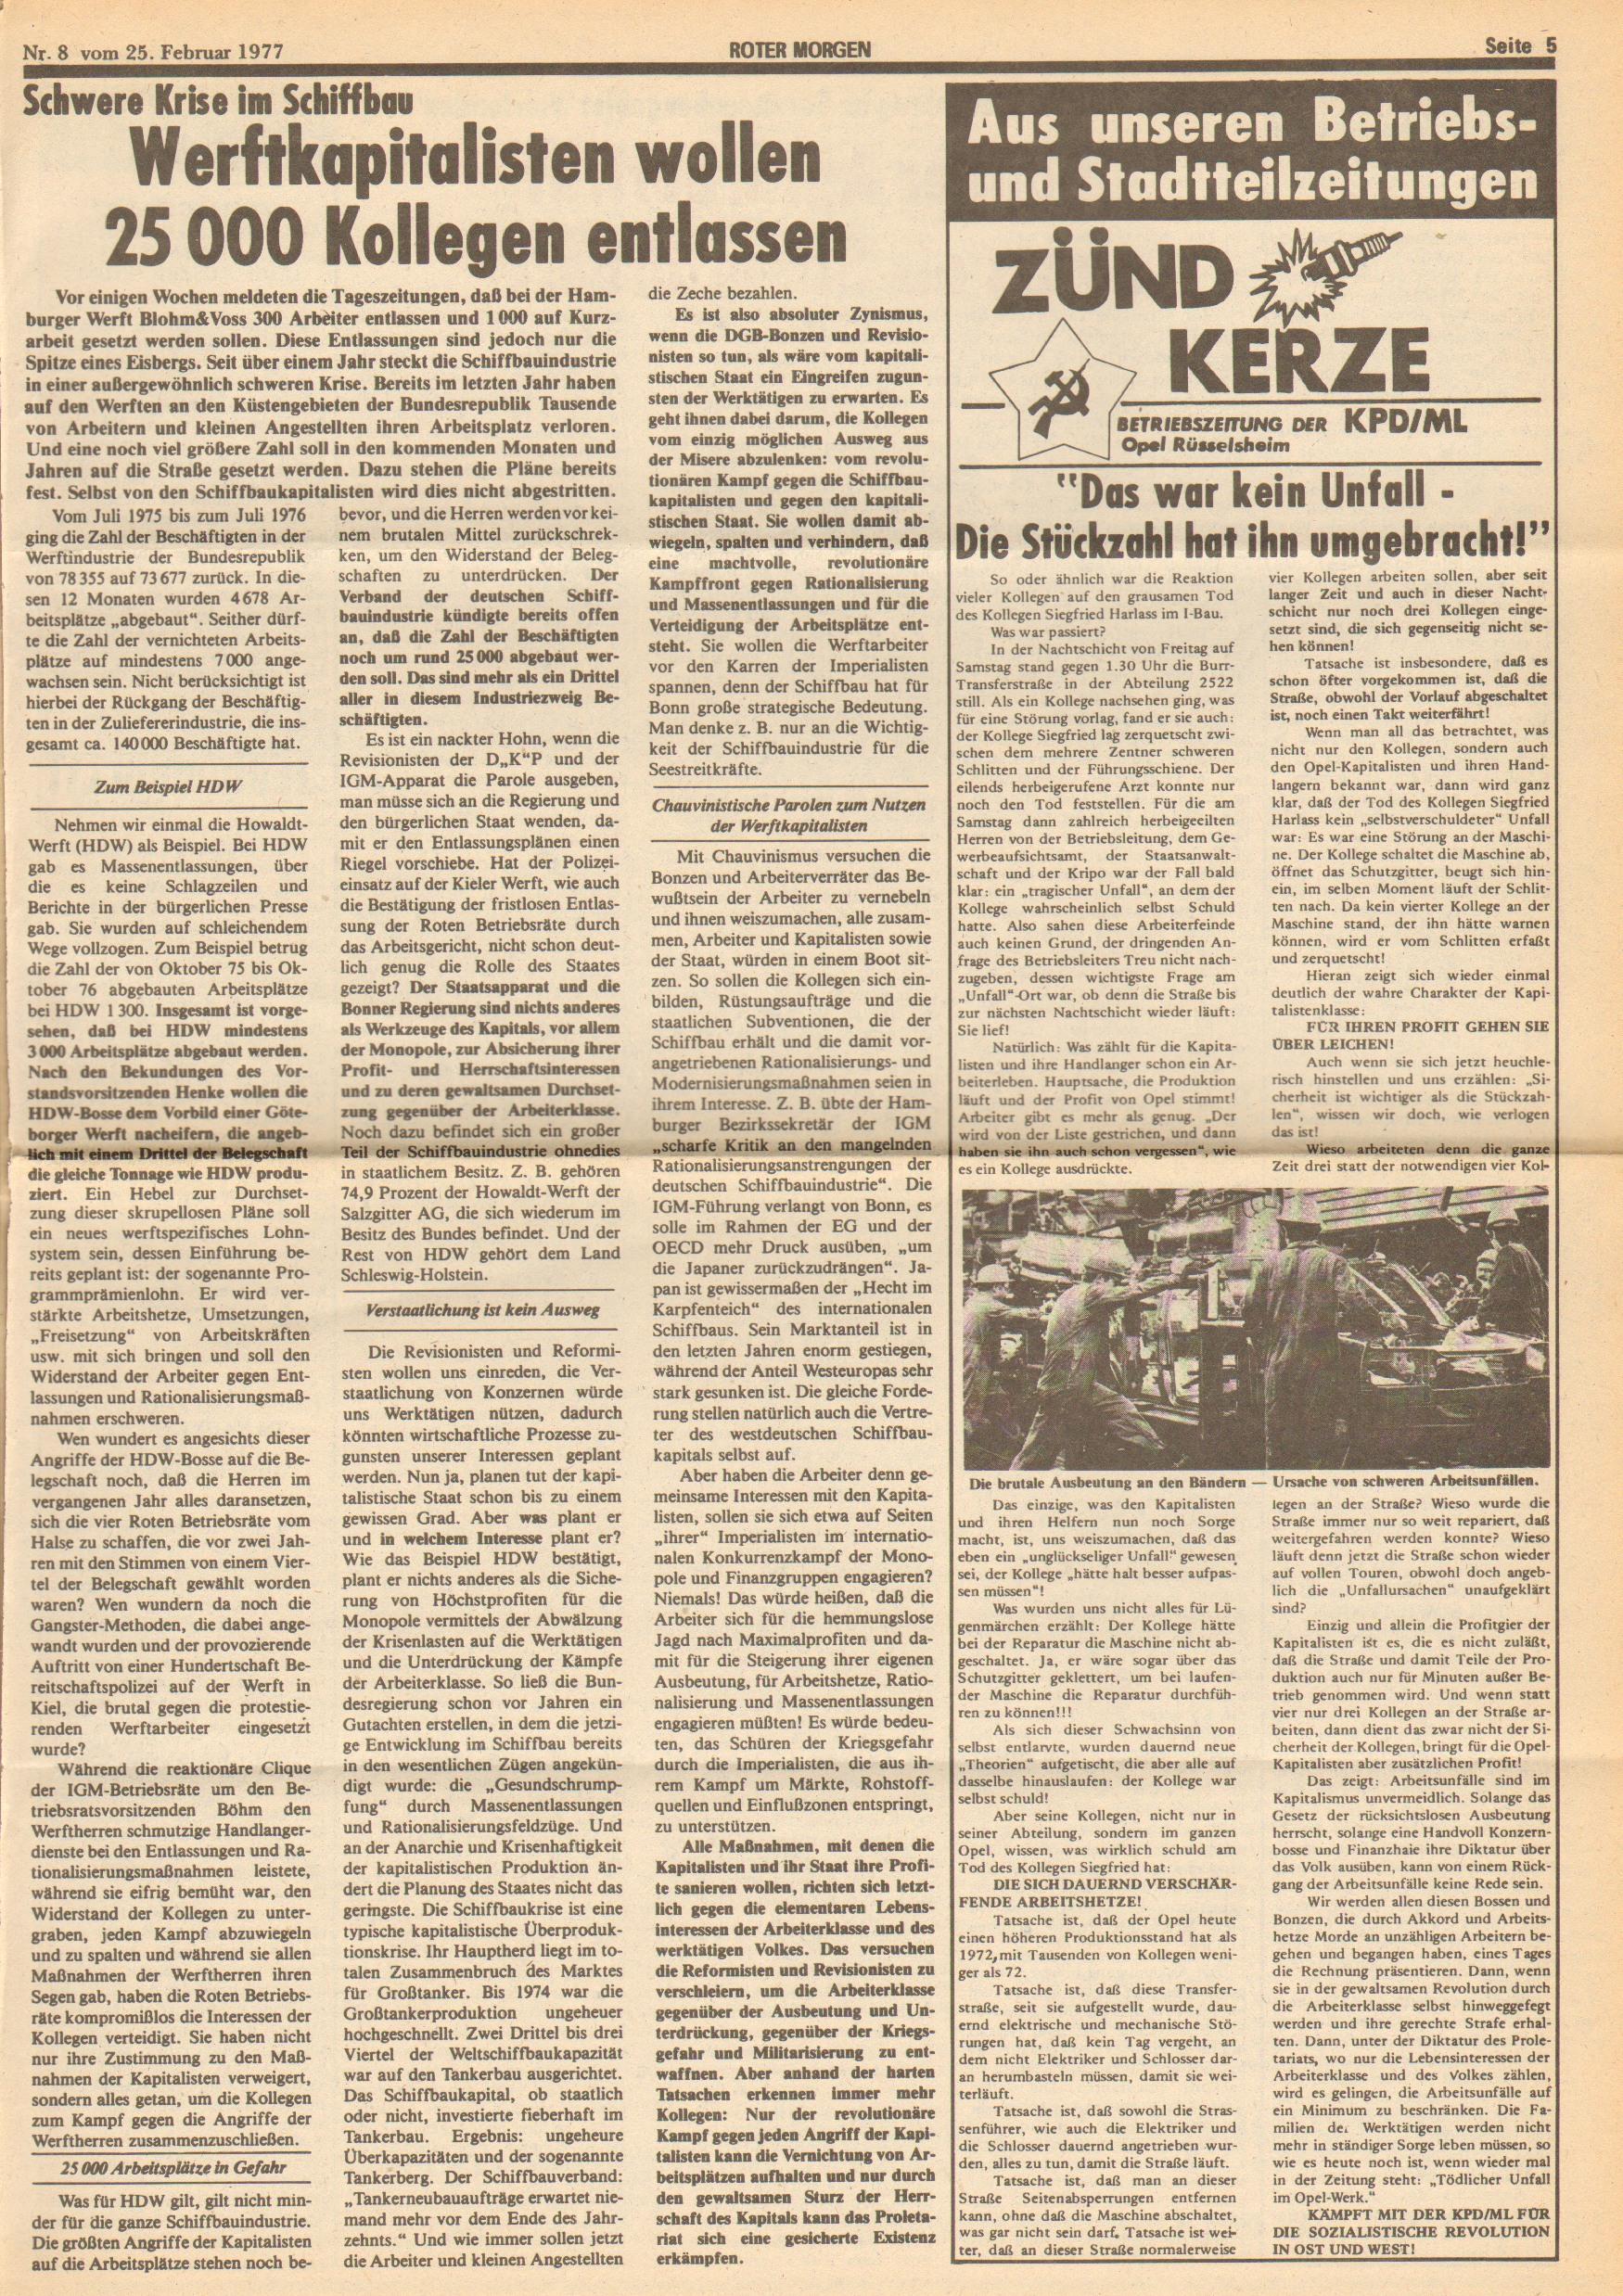 Roter Morgen, 11. Jg.,25. Februar 1977, Nr. 8, Seite 5